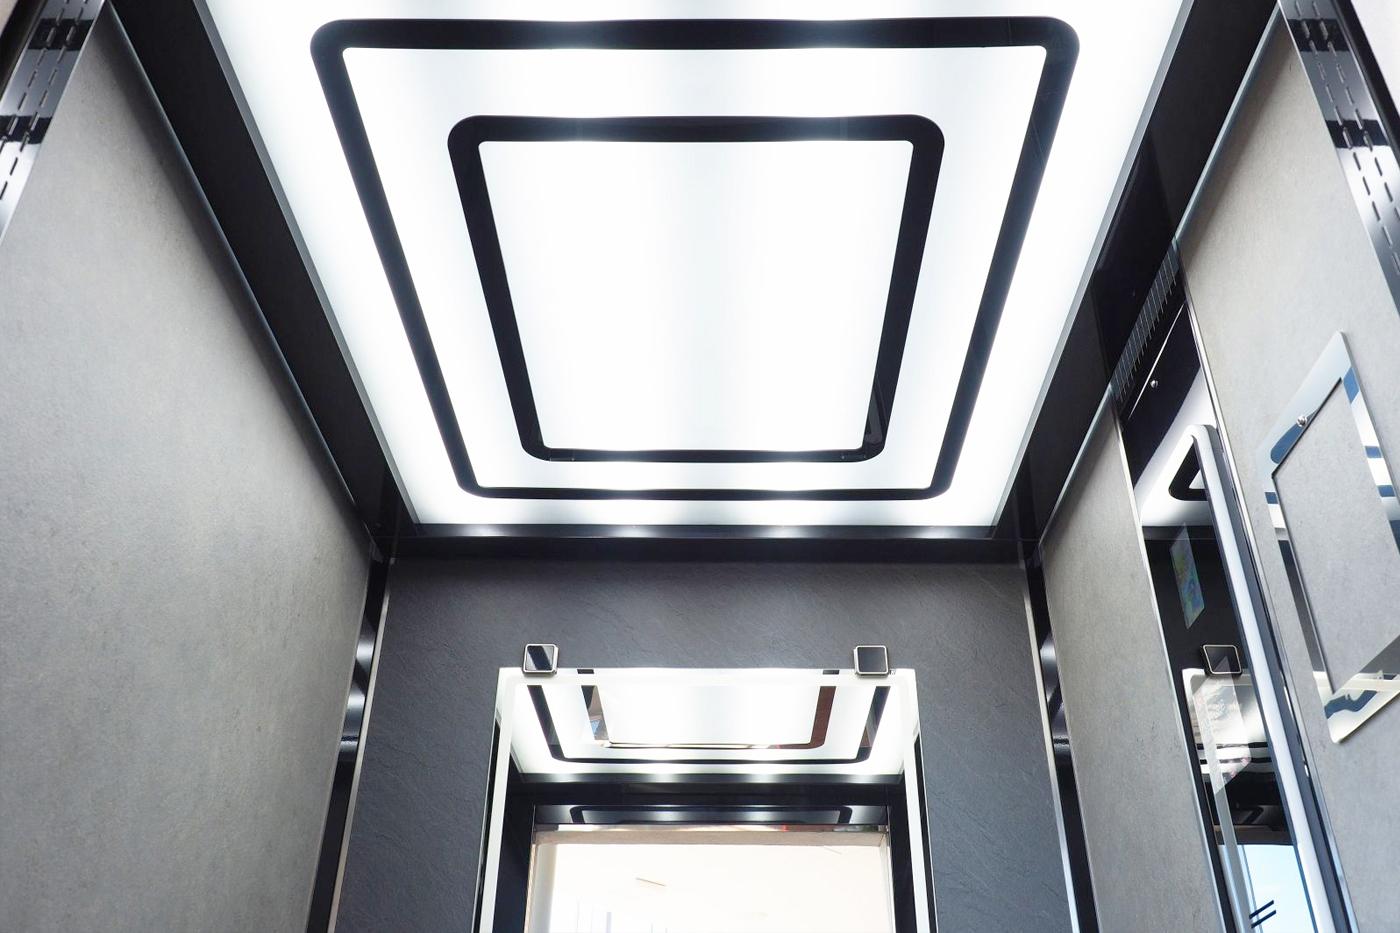 Výsledný design prezentovaný na kabině LC Elegant.